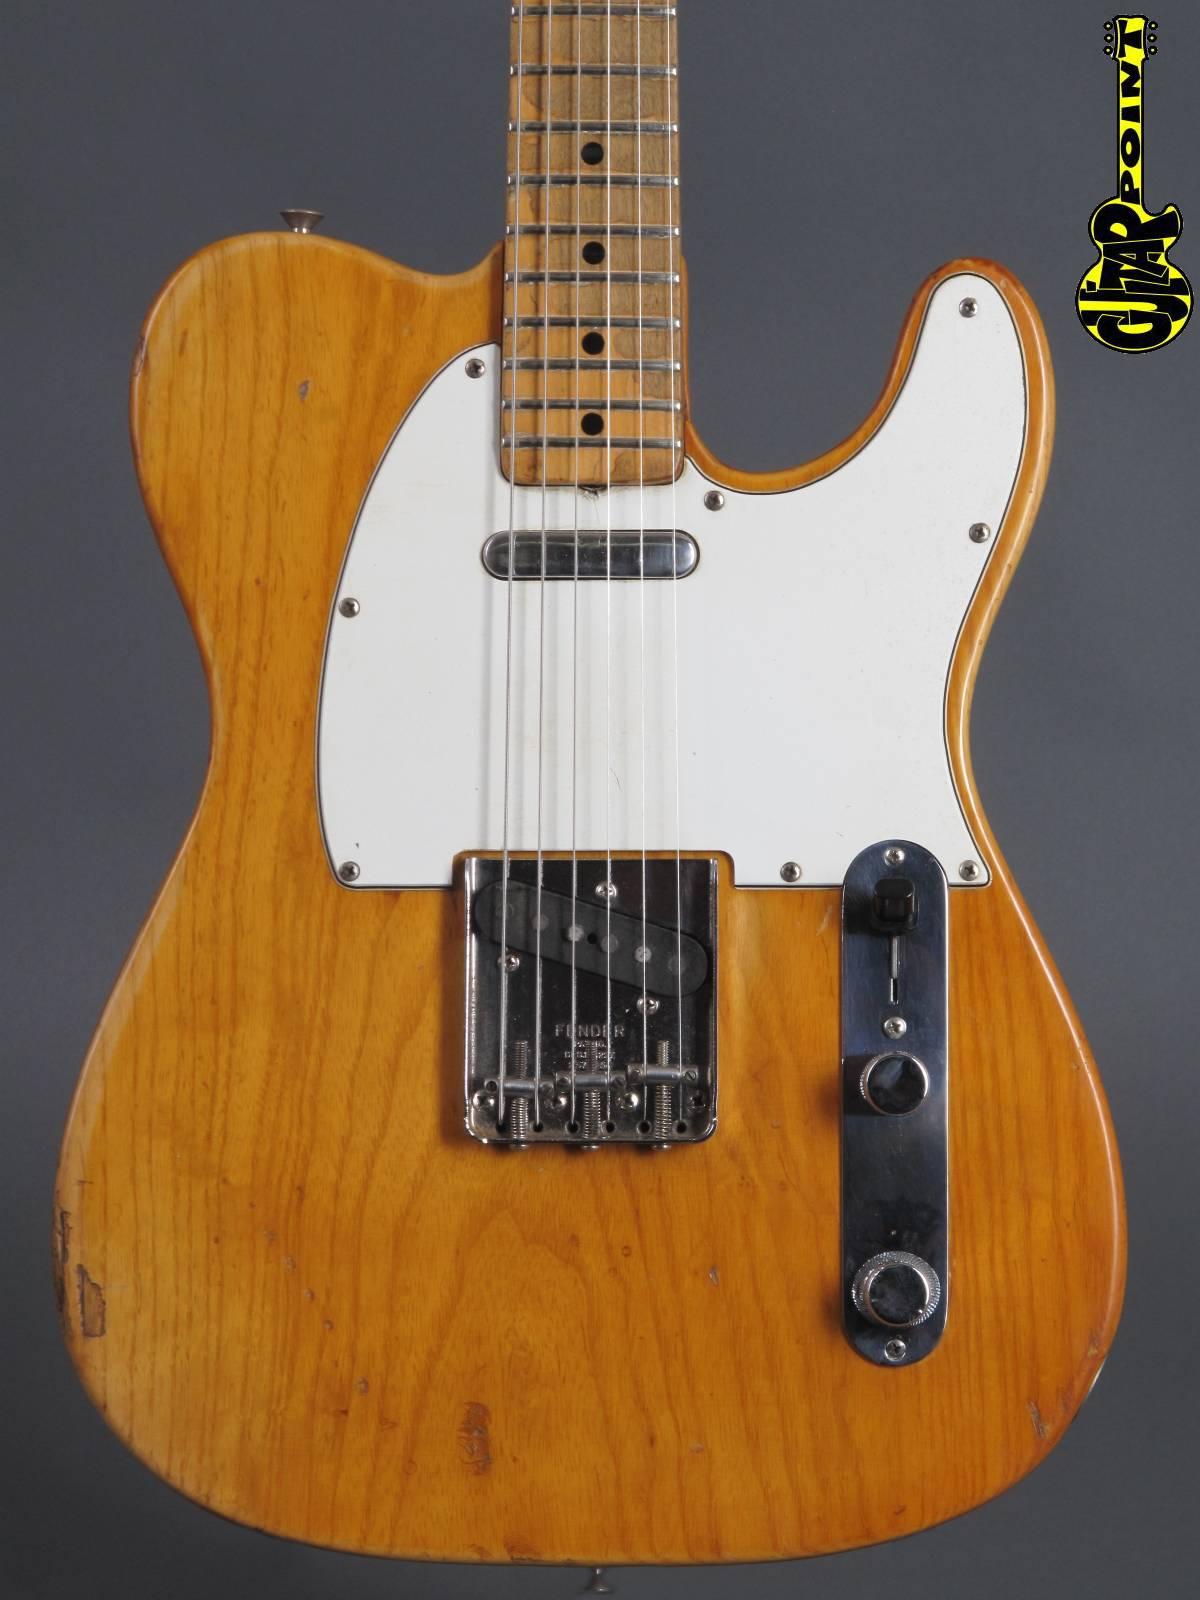 1974 Fender Telecaster - Natural = Mojo !!!